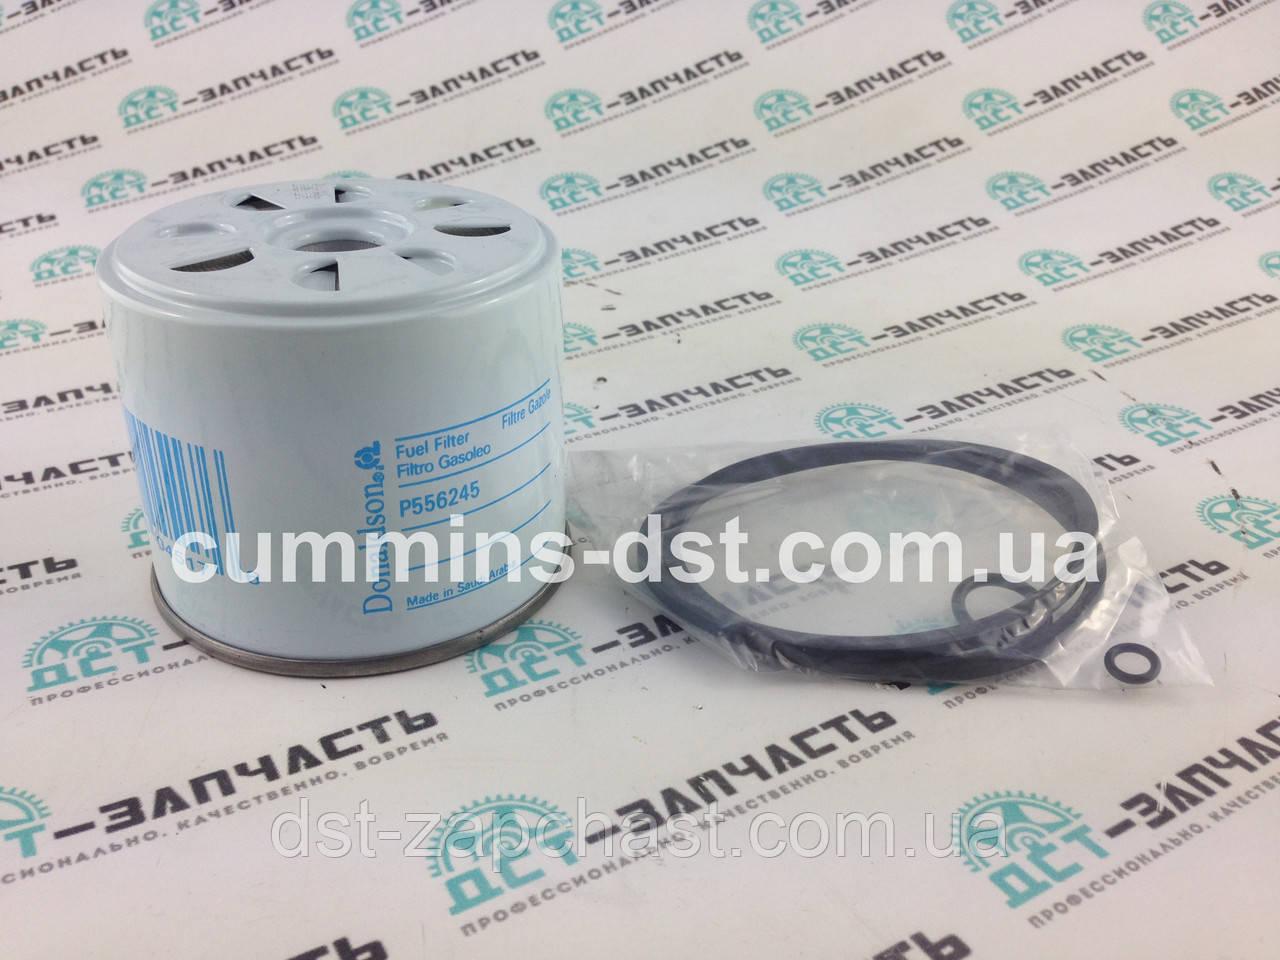 Фильтр топлива для сепаратора P556245/BF825/WF8018/33166/P917x